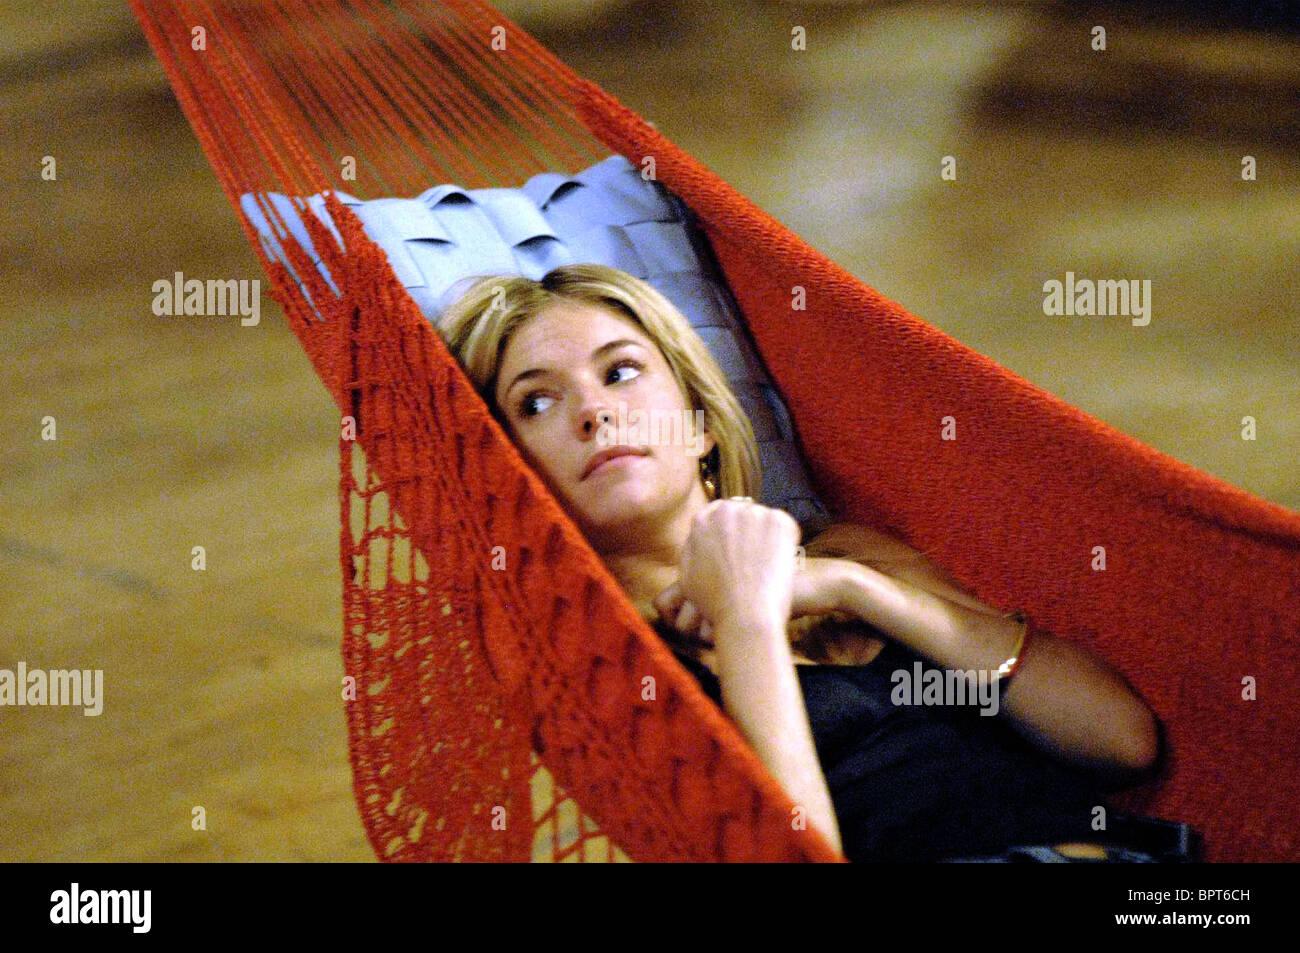 SIENNA MILLER INTERVIEW (2007) - Stock Image